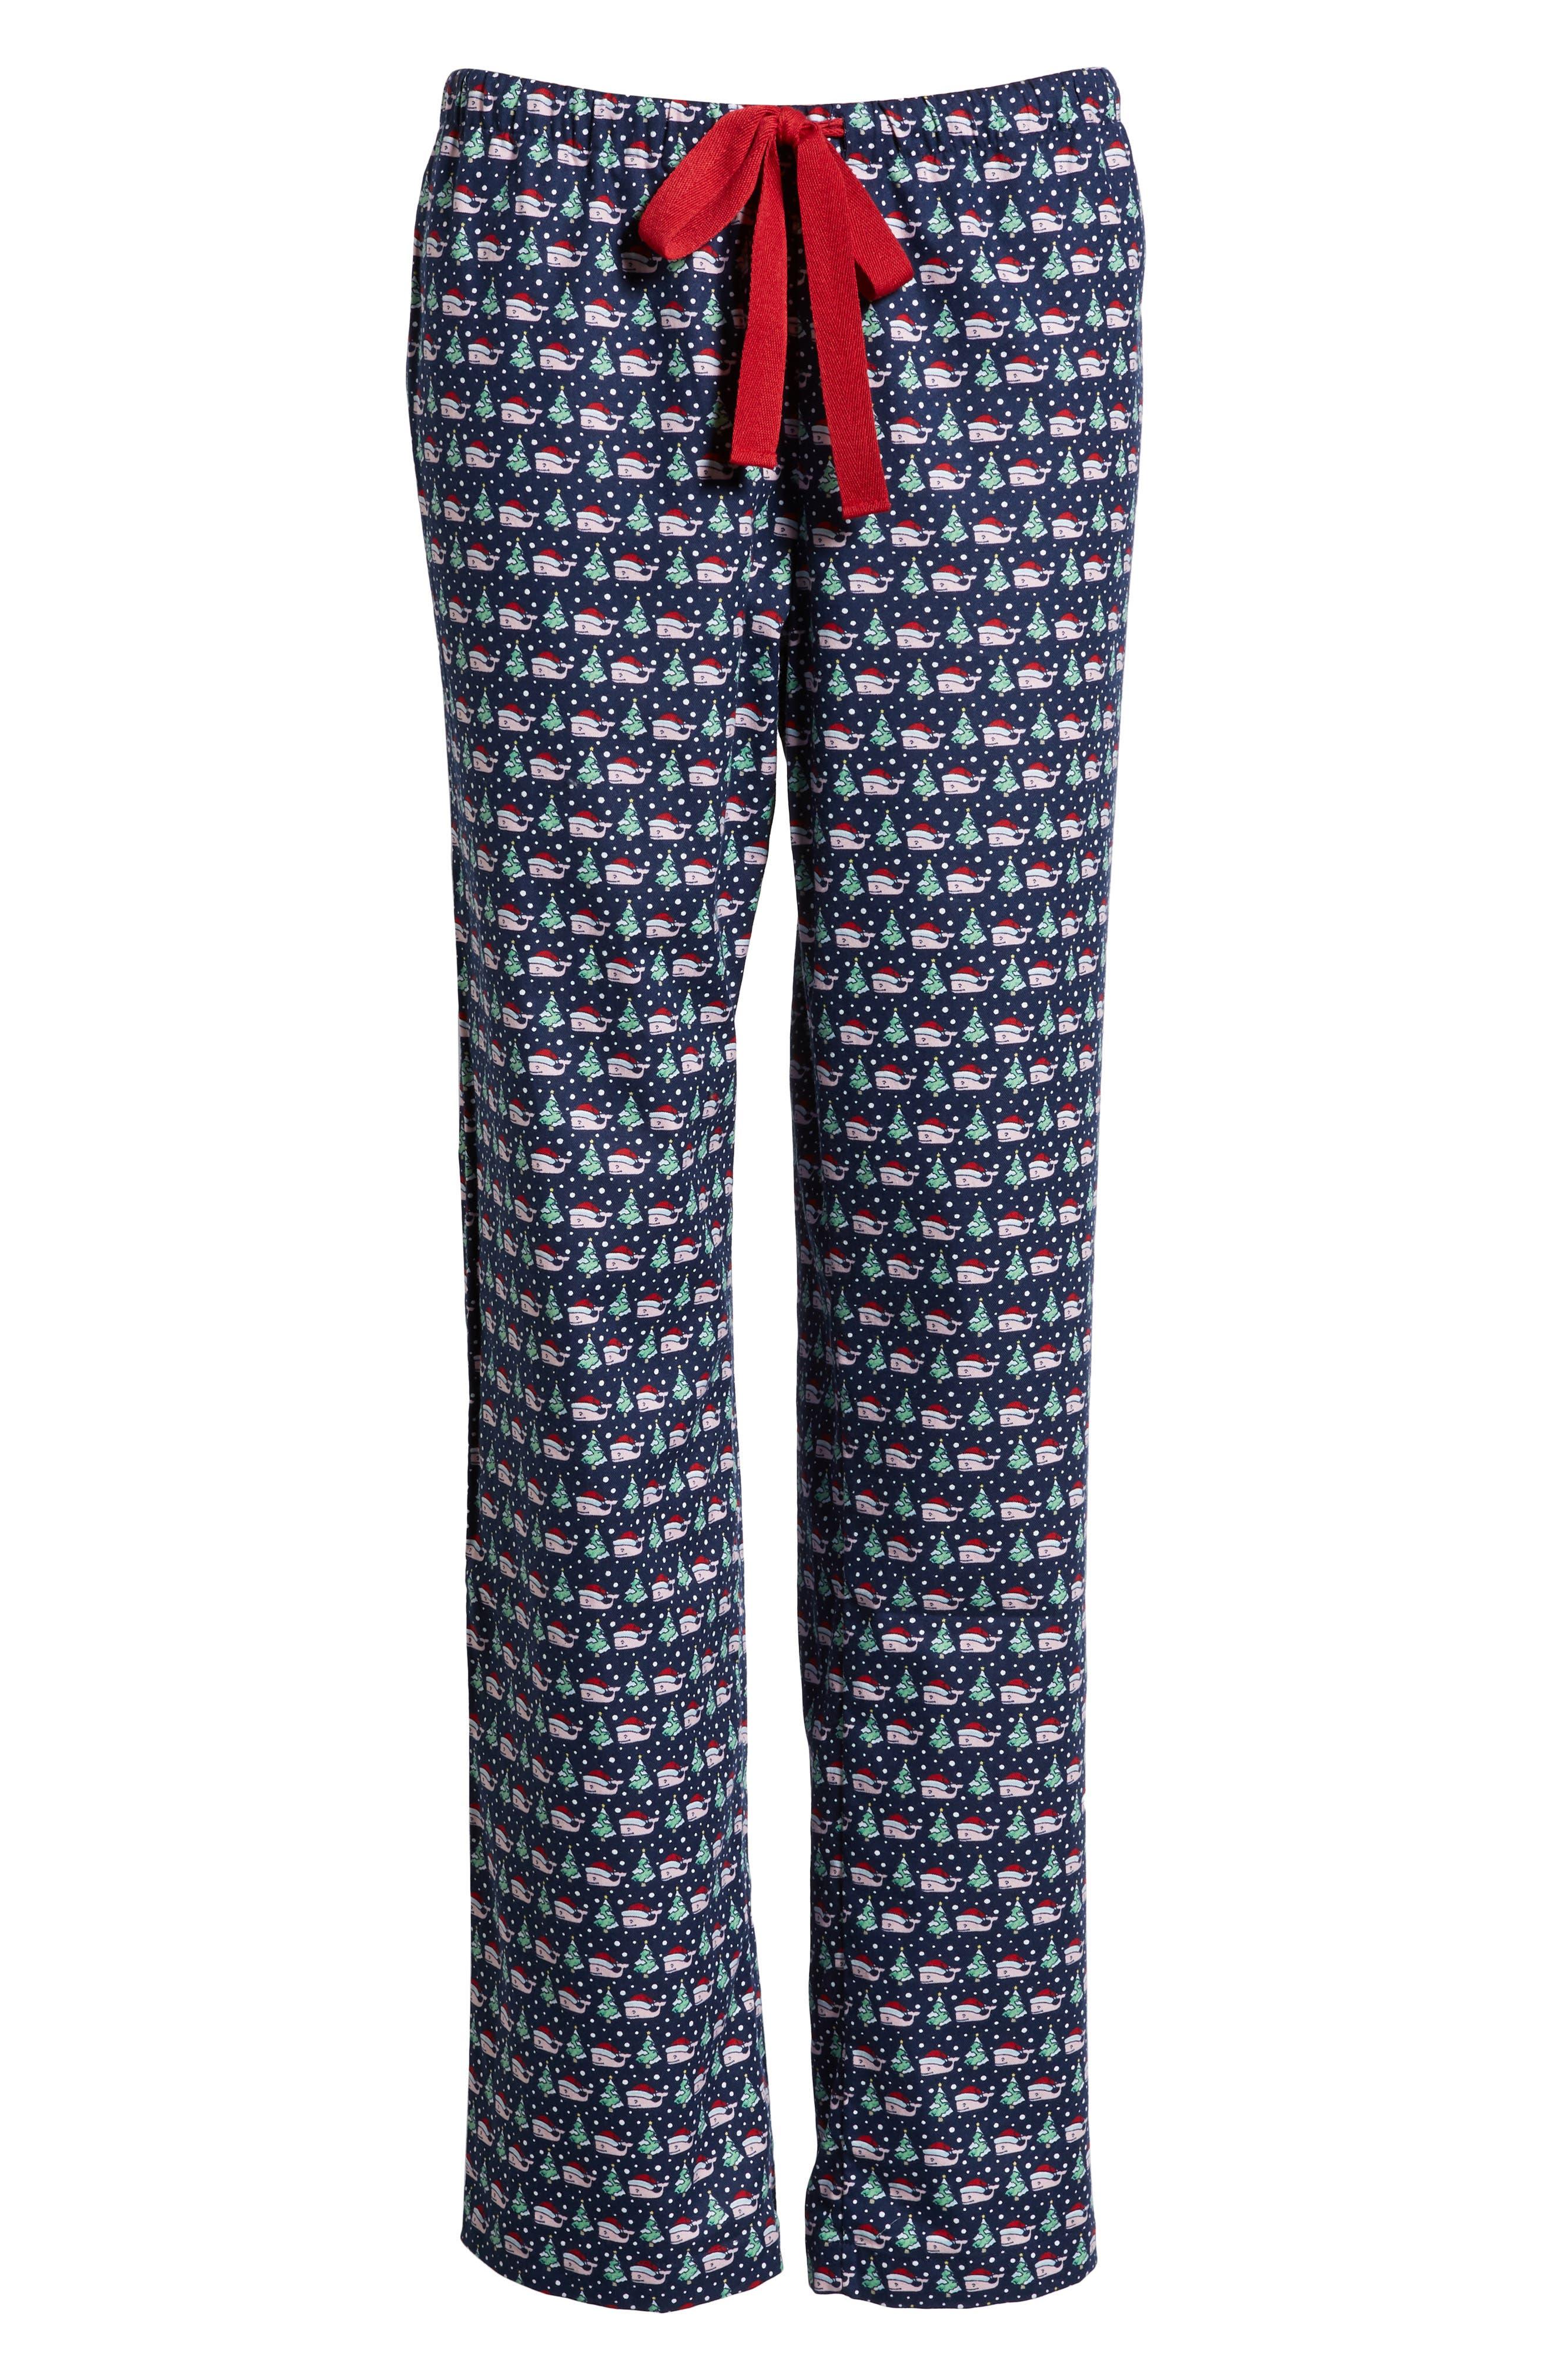 Santa Whale Lounge Pants,                             Alternate thumbnail 6, color,                             DEEP BAY